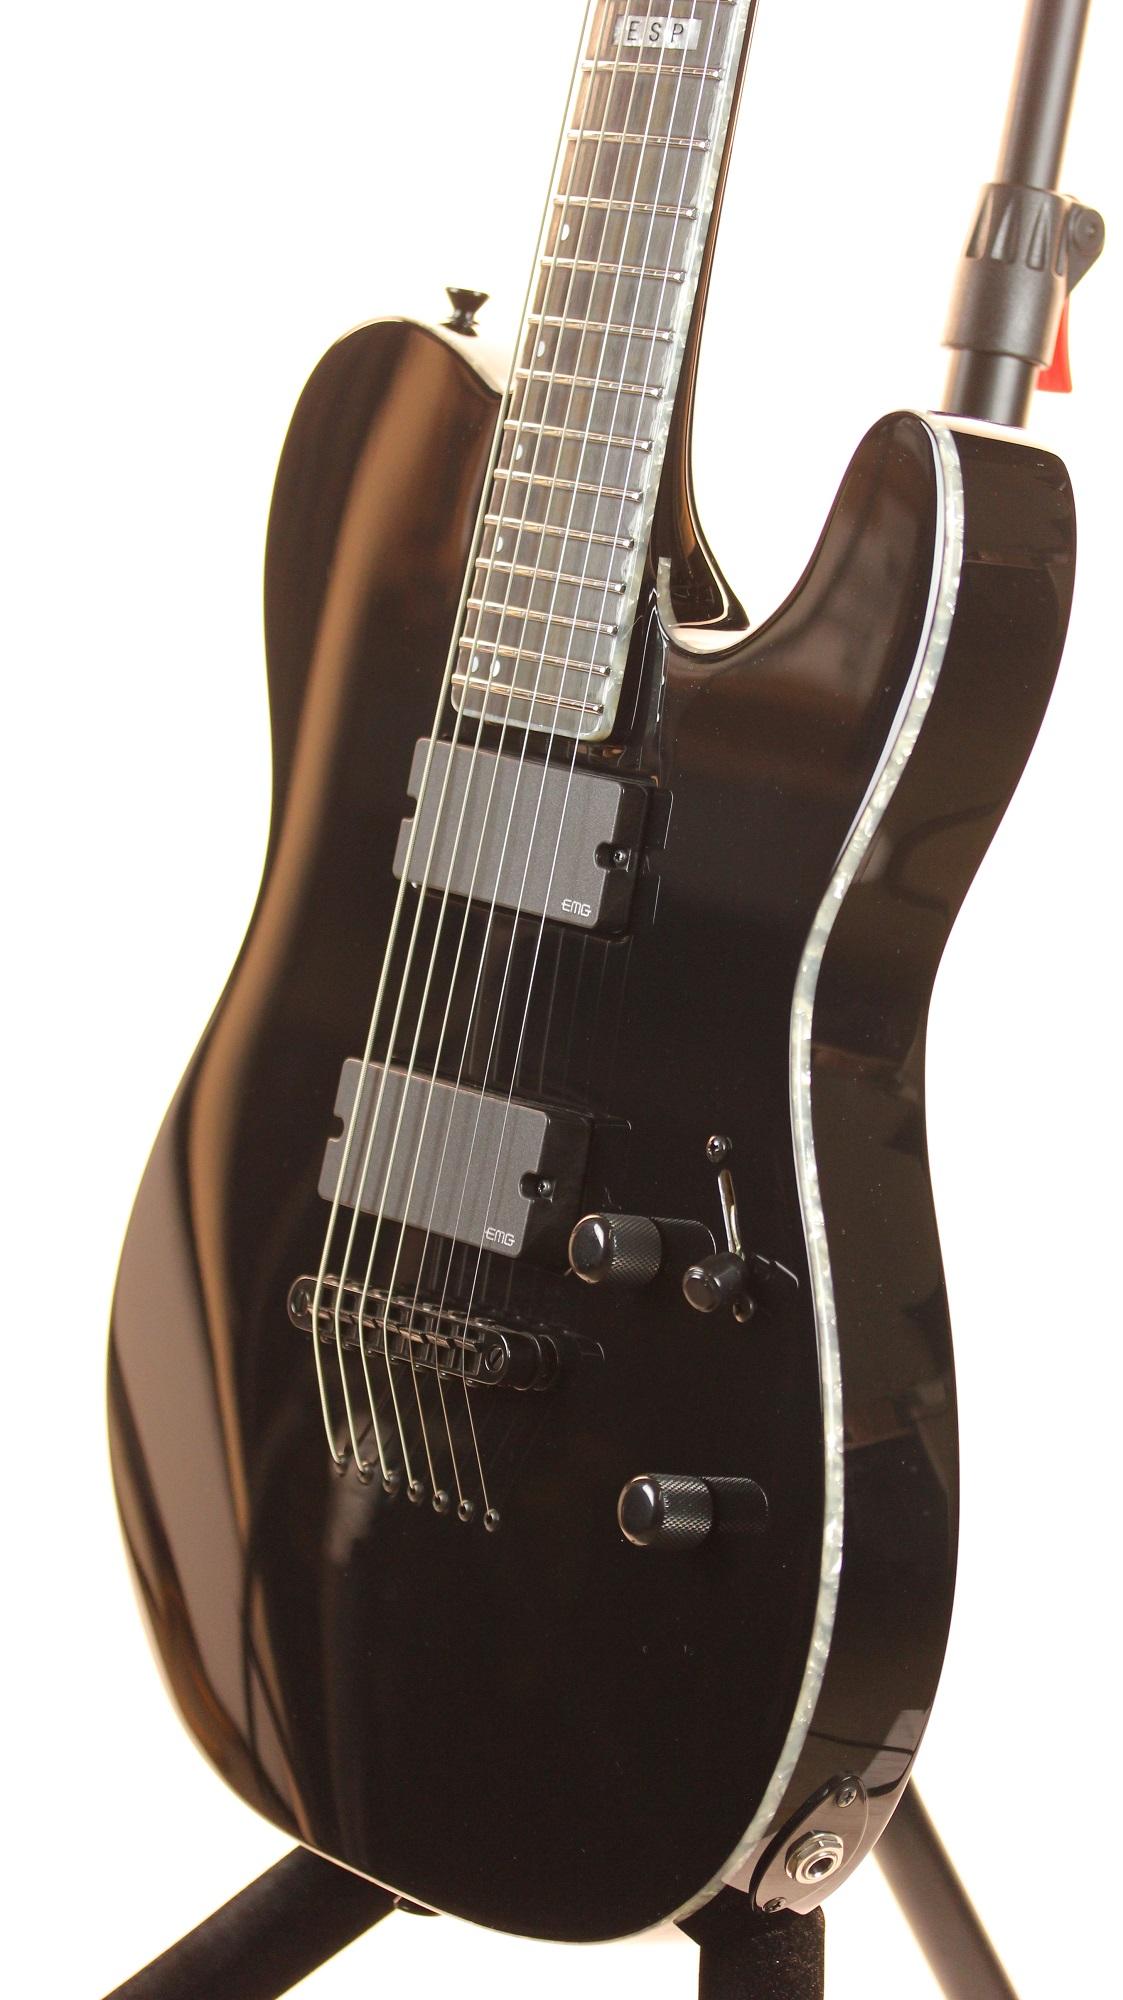 esp e ii te 7 tele black 7 string electric guitar w case 6. Black Bedroom Furniture Sets. Home Design Ideas